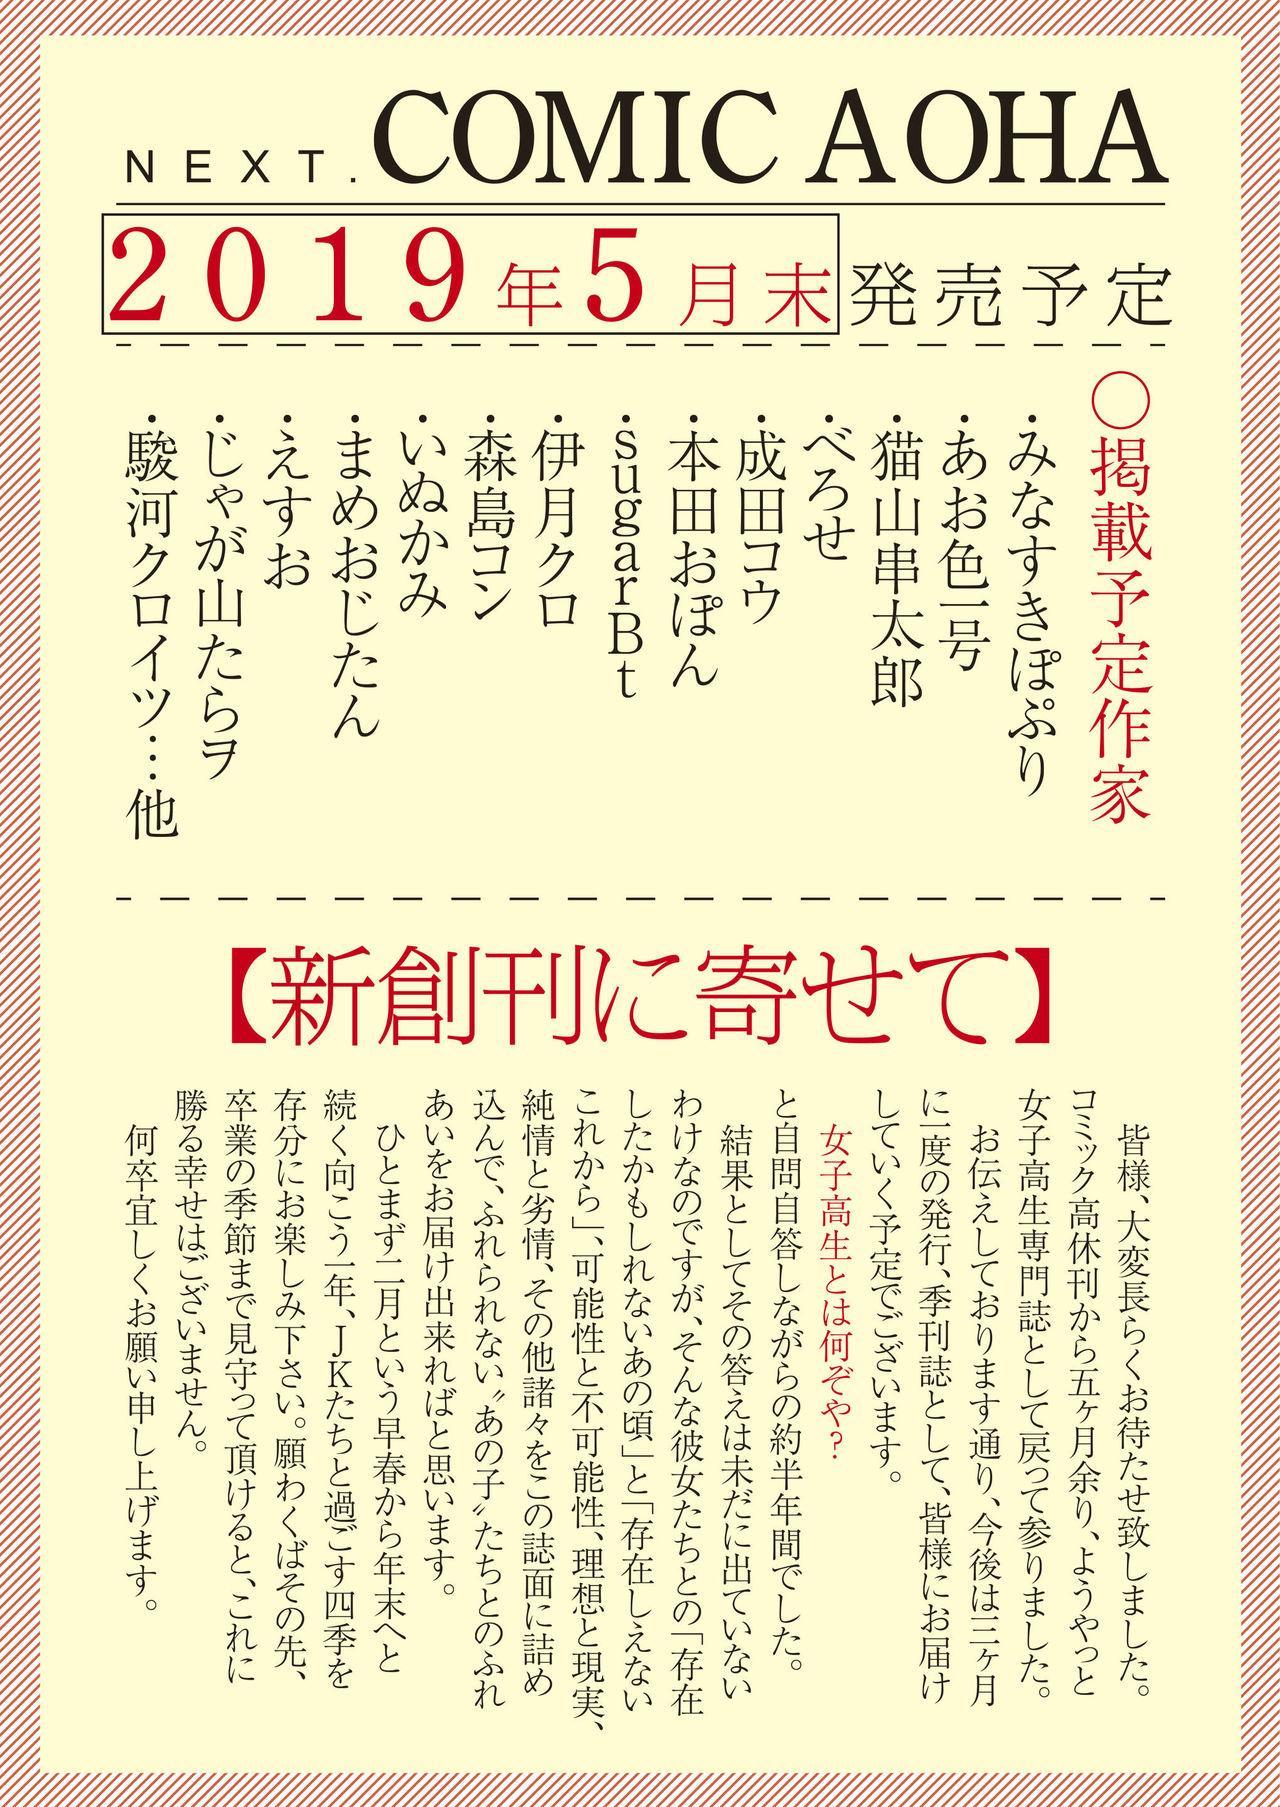 COMIC AOHA 2019 Haru 490